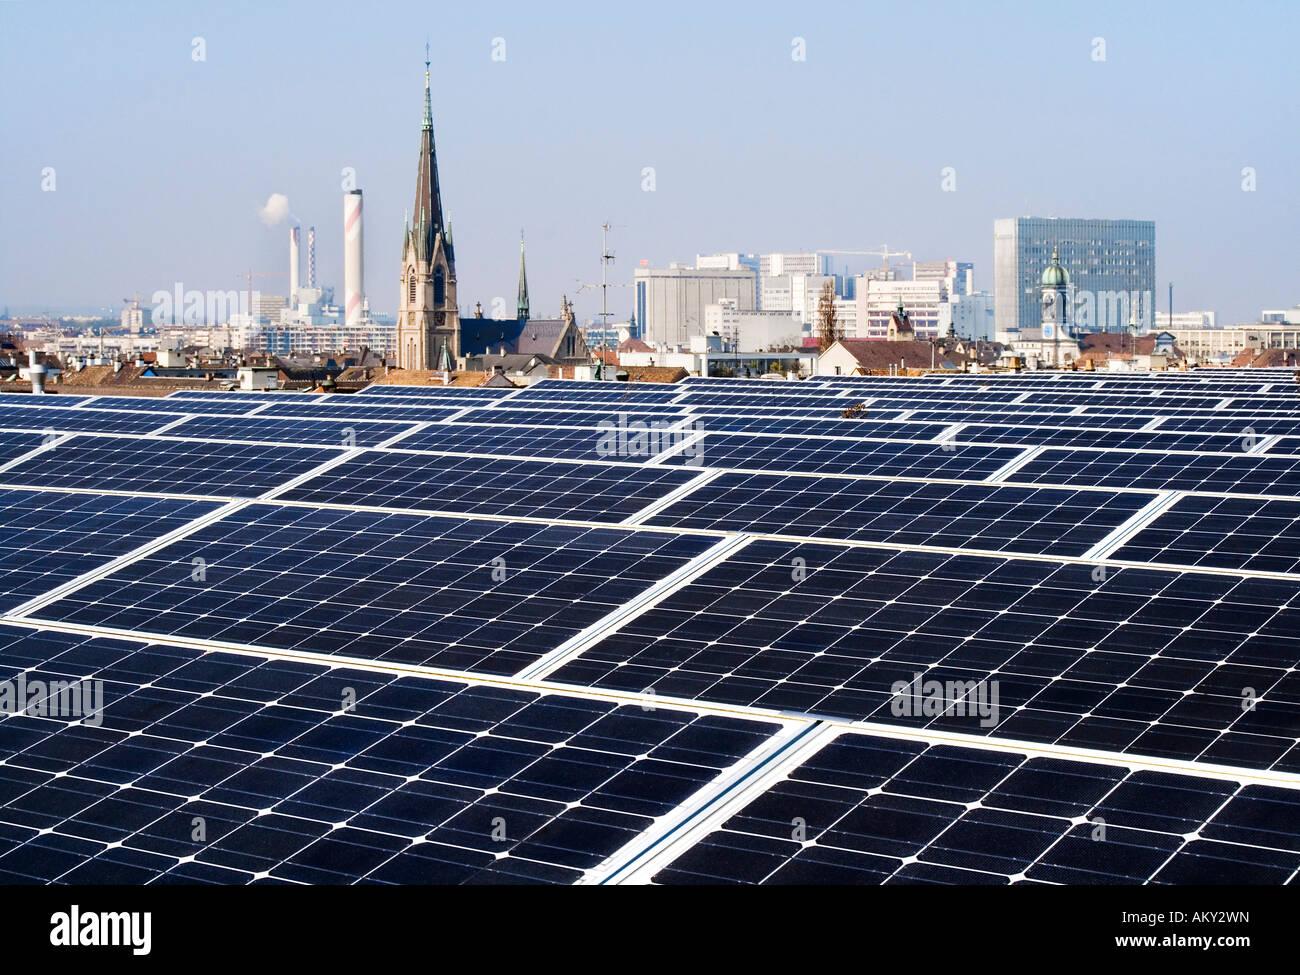 Solar panels, trade fair, Basel, Switzerland - Stock Image